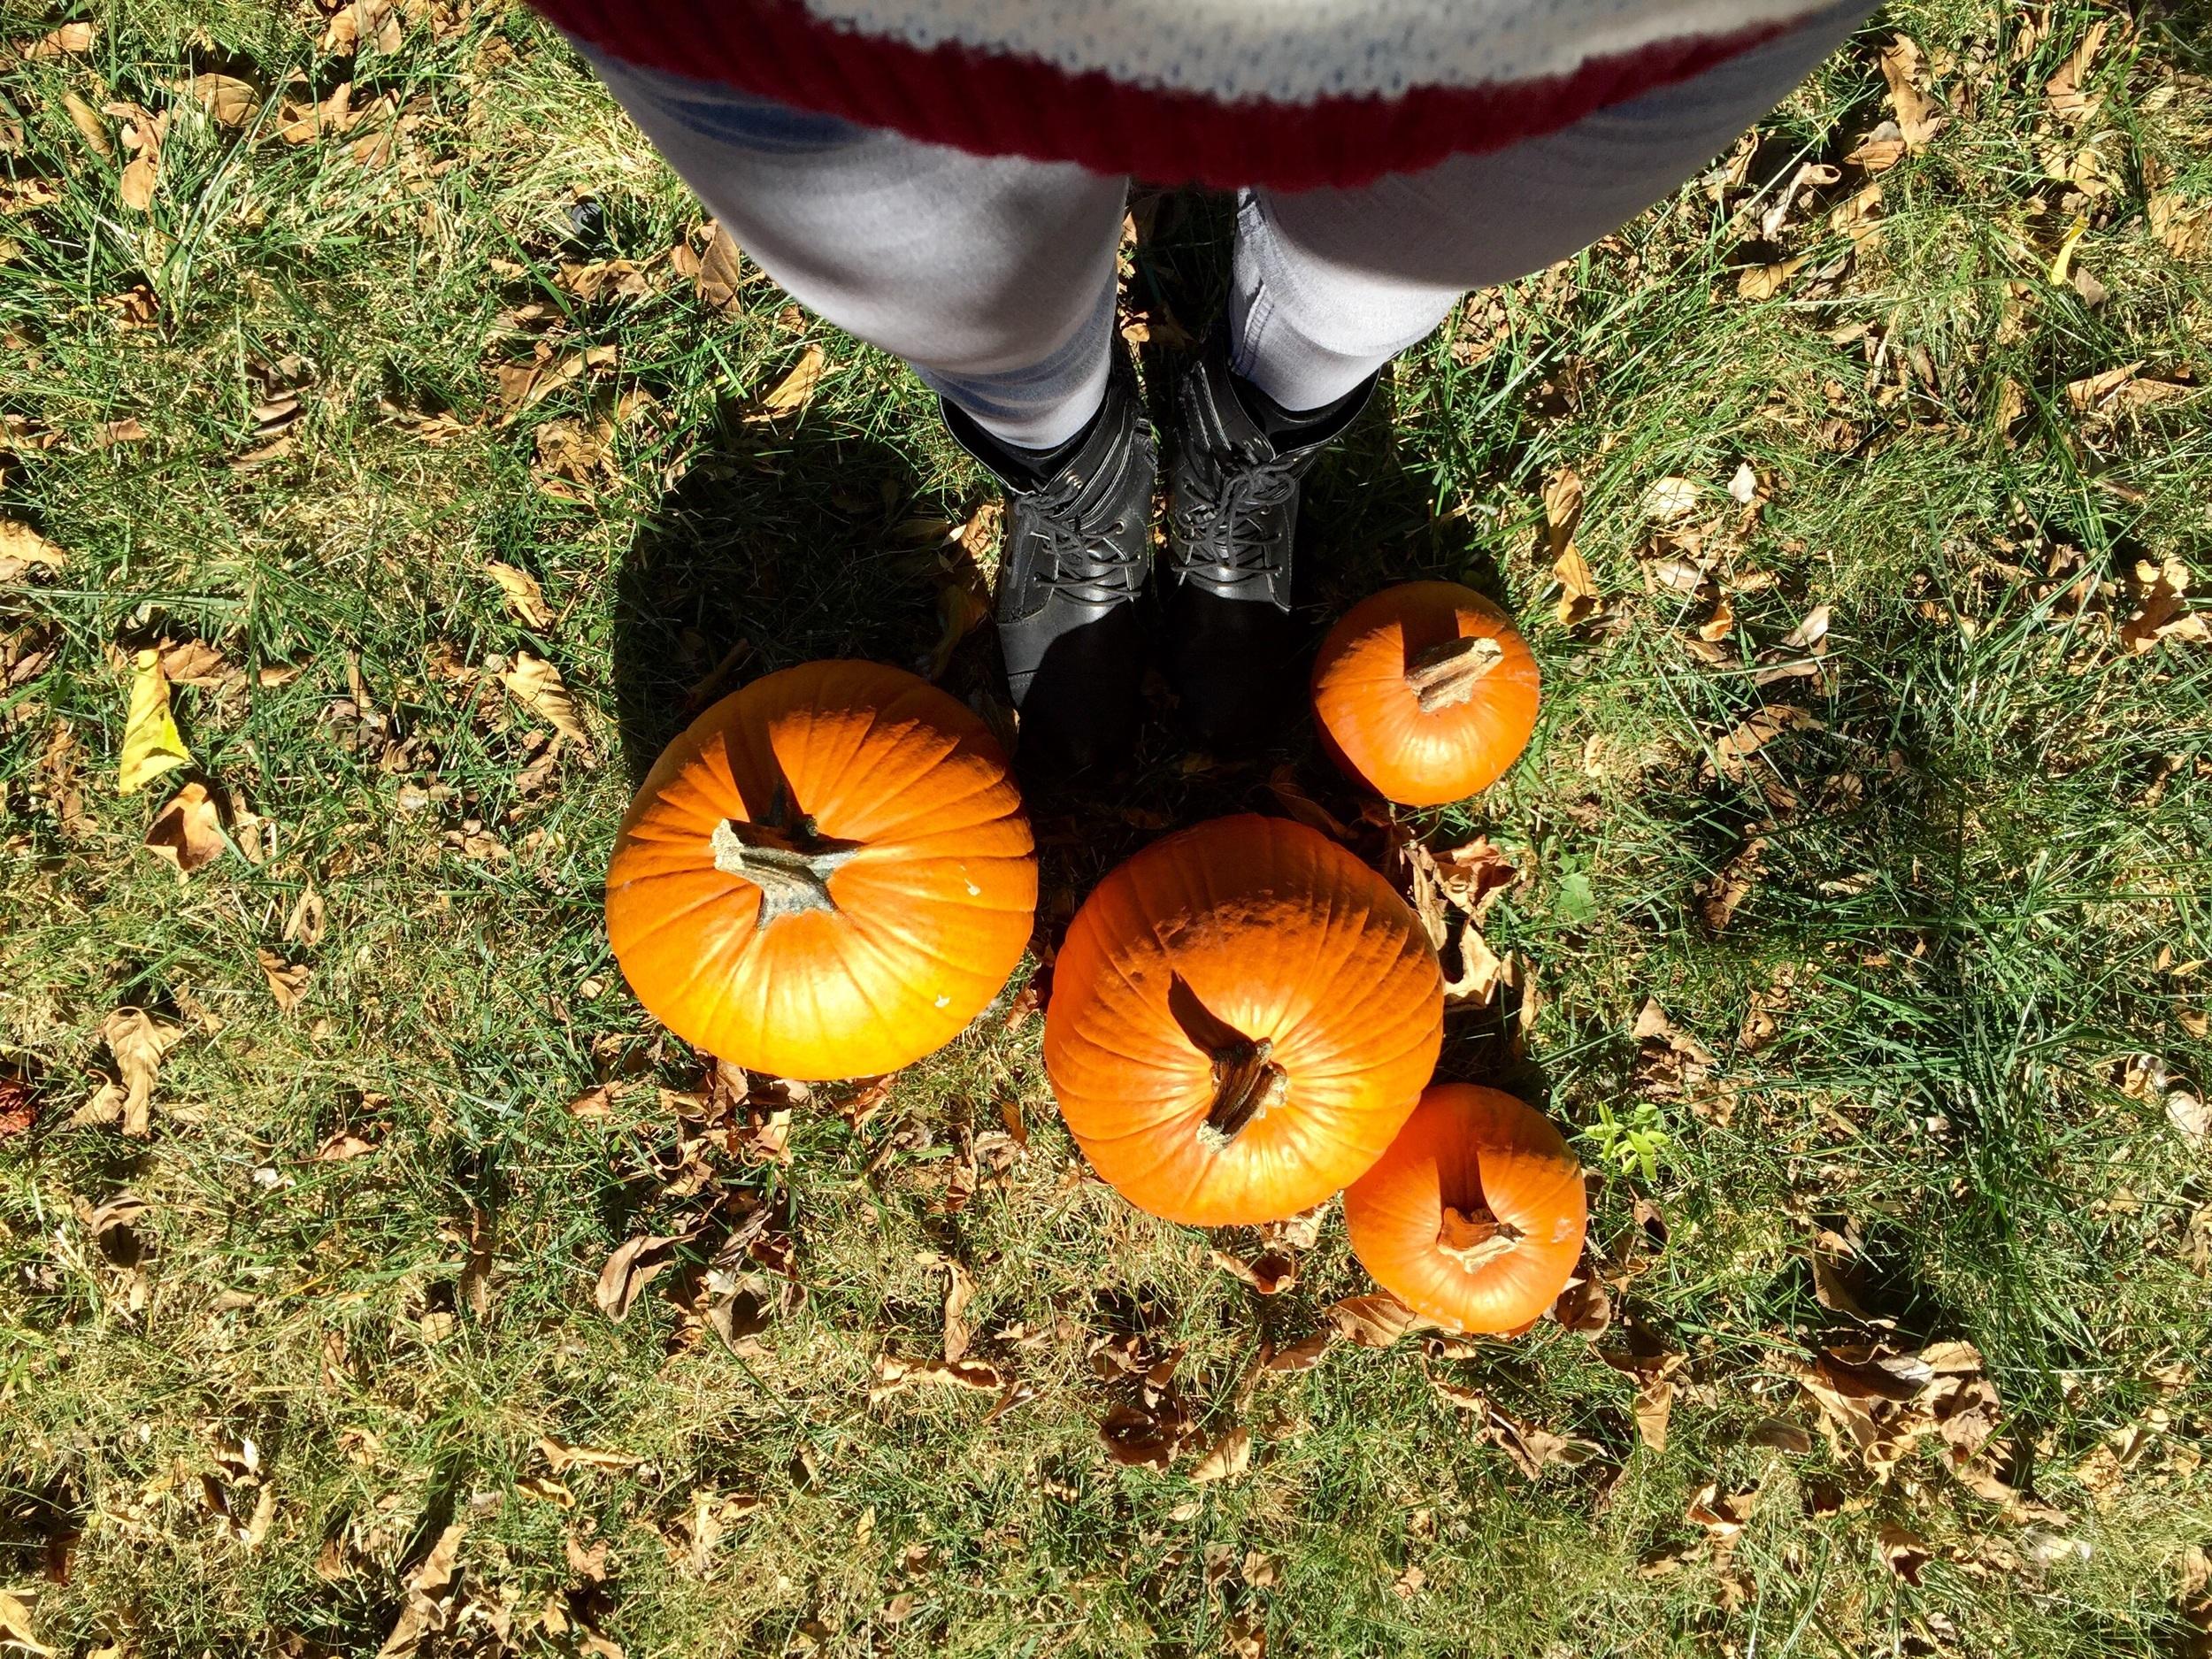 Halloween and craving Pumpkins is always an October FAvorite